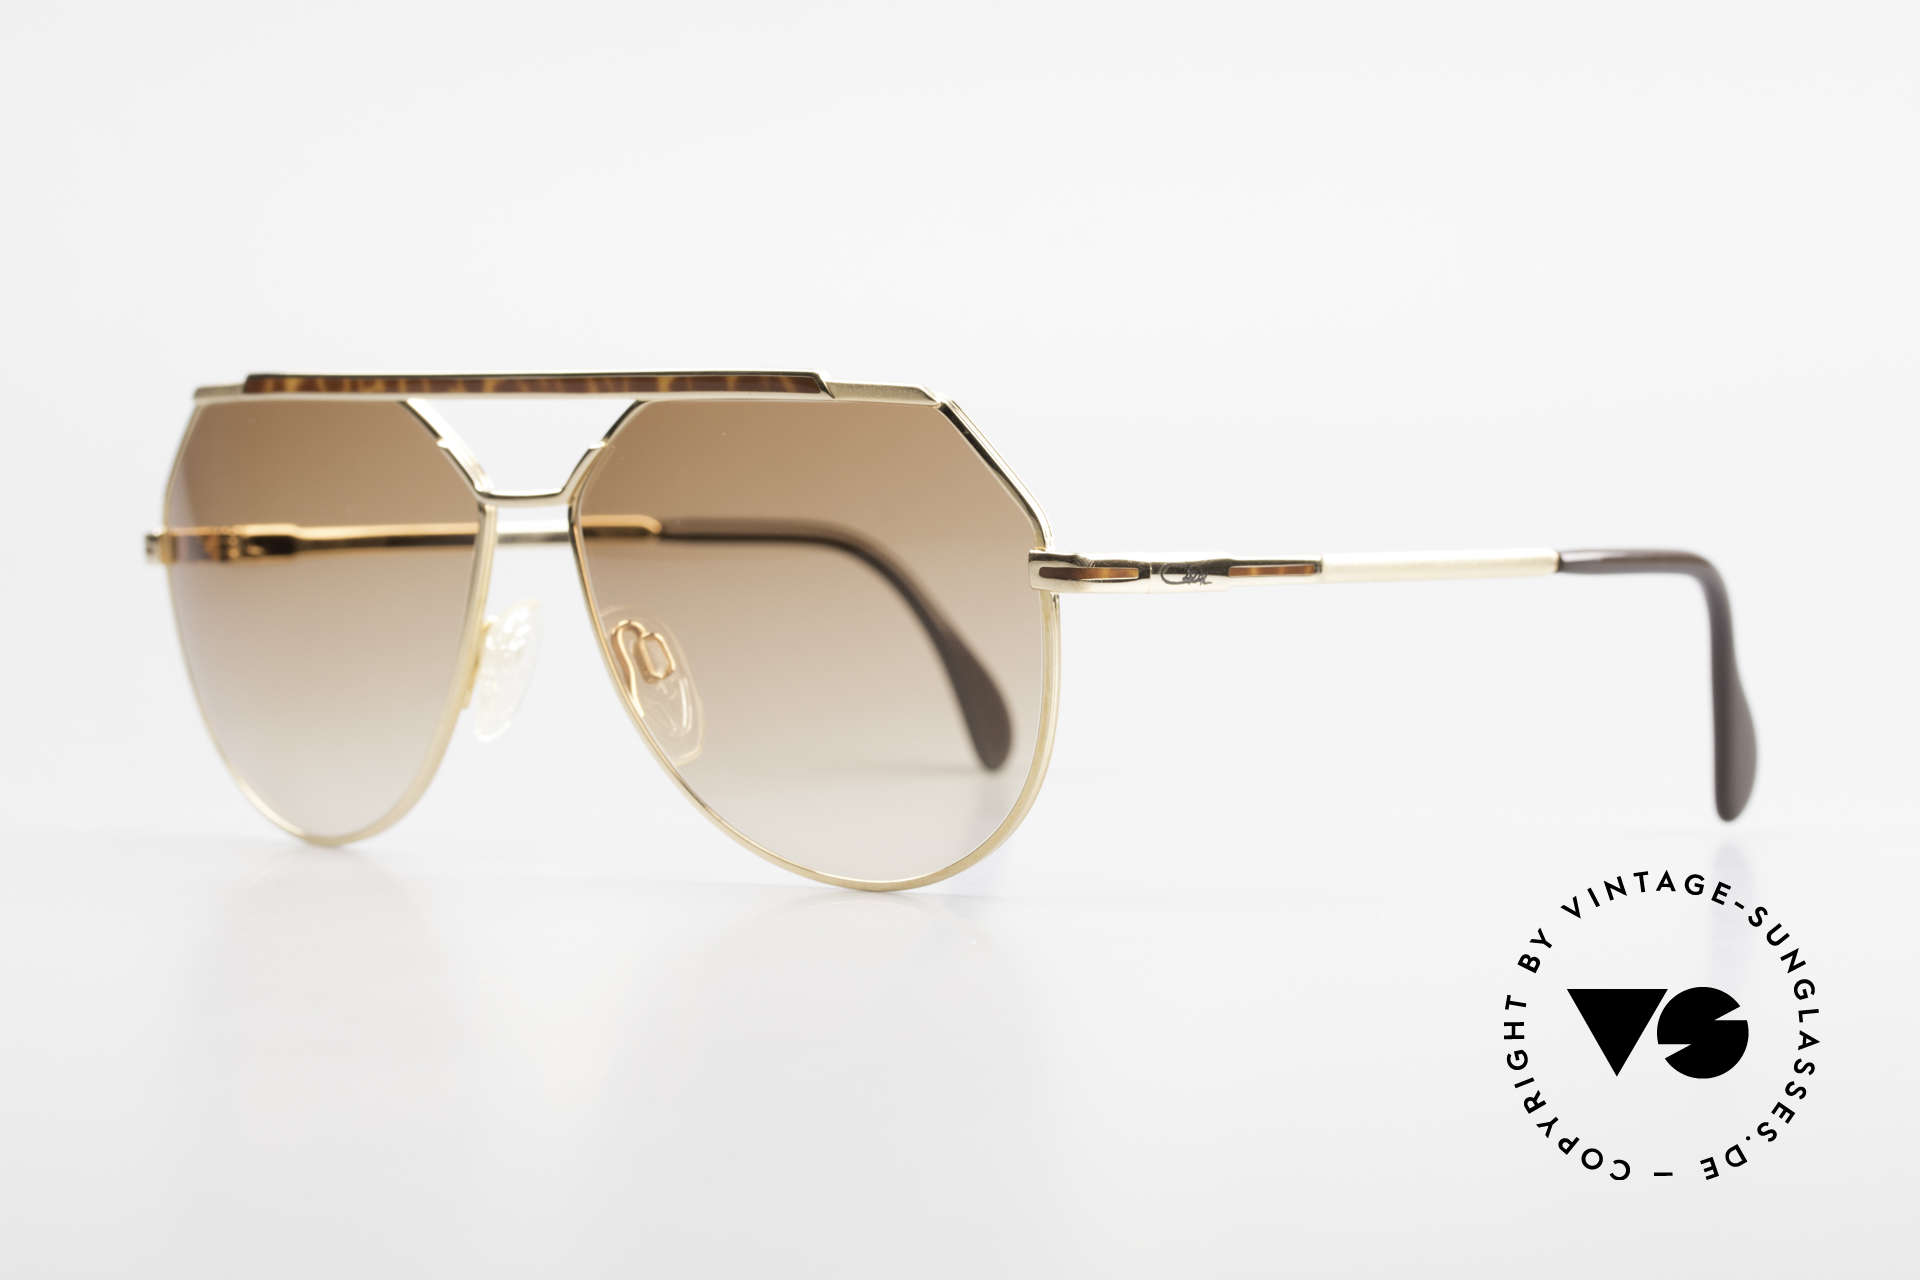 Cazal 733 80's Men's Aviator Sunglasses, finest craftsmanship & neat frame decor; size 60-13, Made for Men